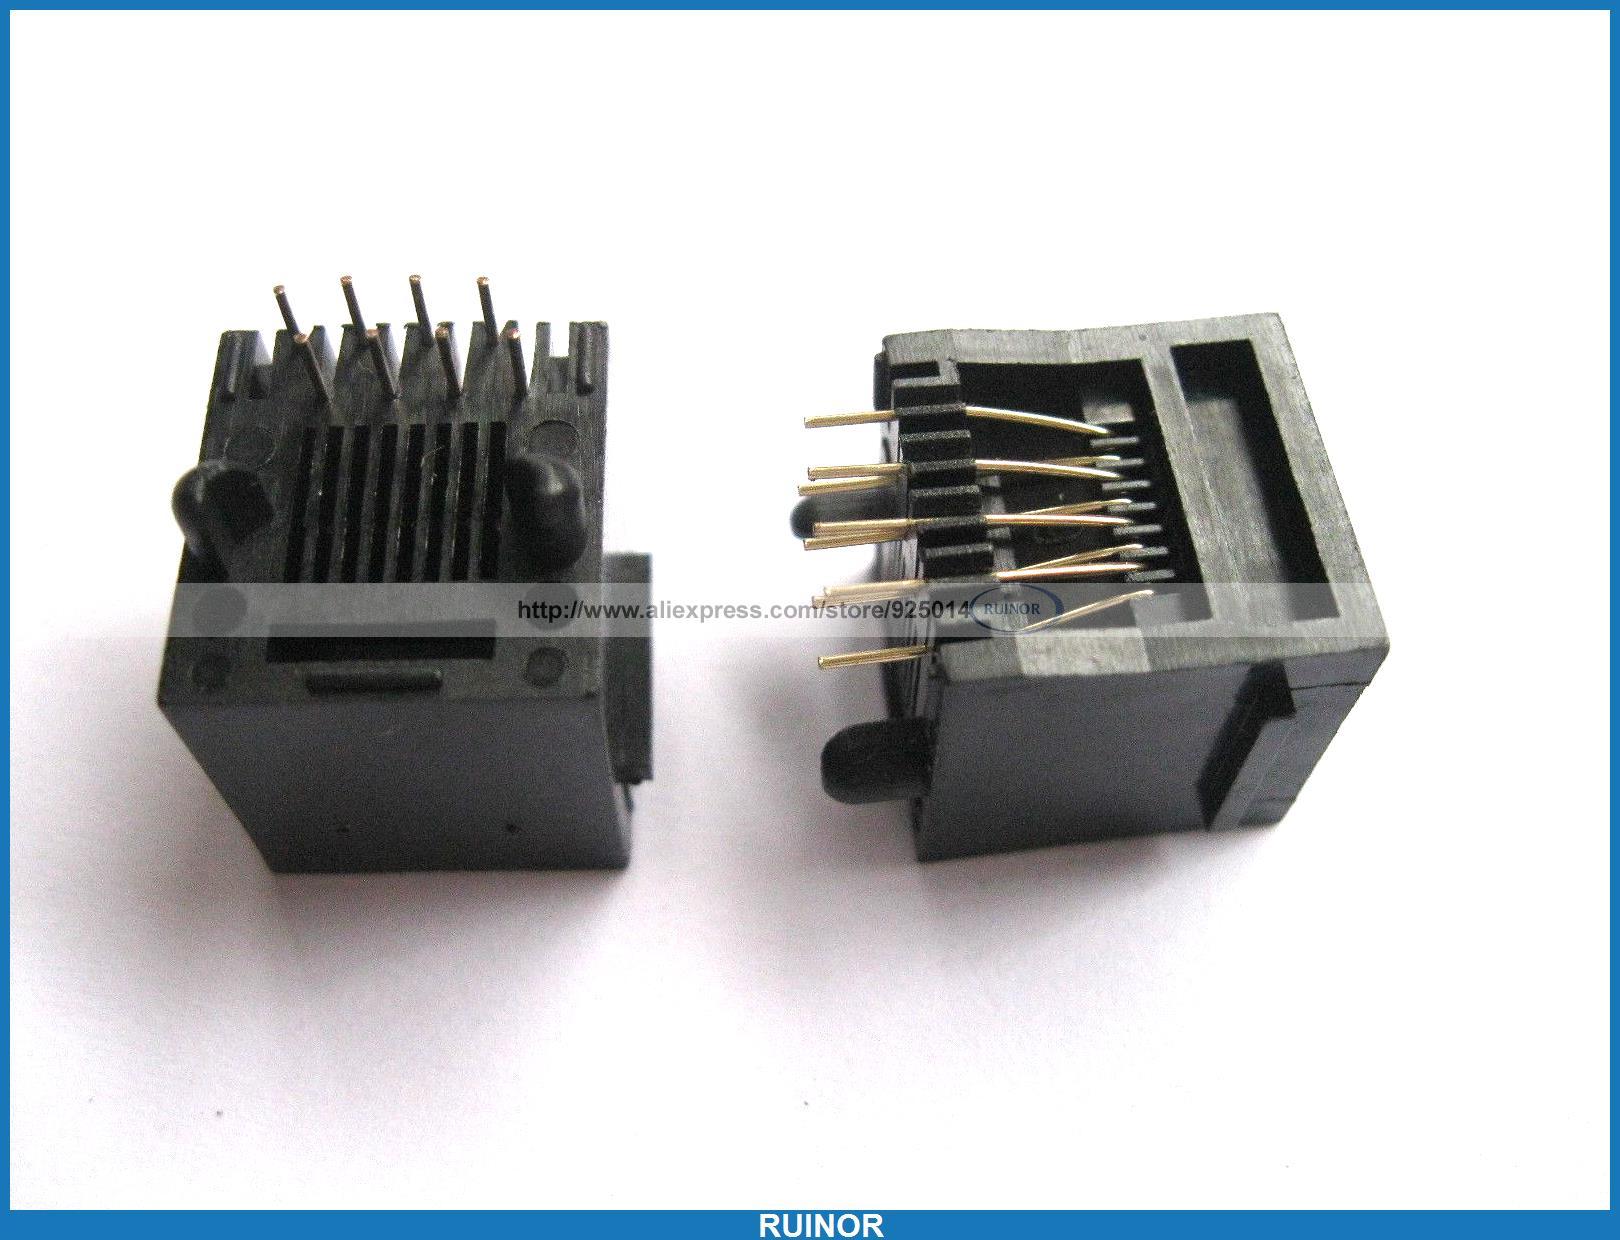 50 Pcs RJ45 Modular Network PCB Jack Connector 5222 8P8C 24 pcs rj45 modular network pcb jack 56 8p w led 4 ports